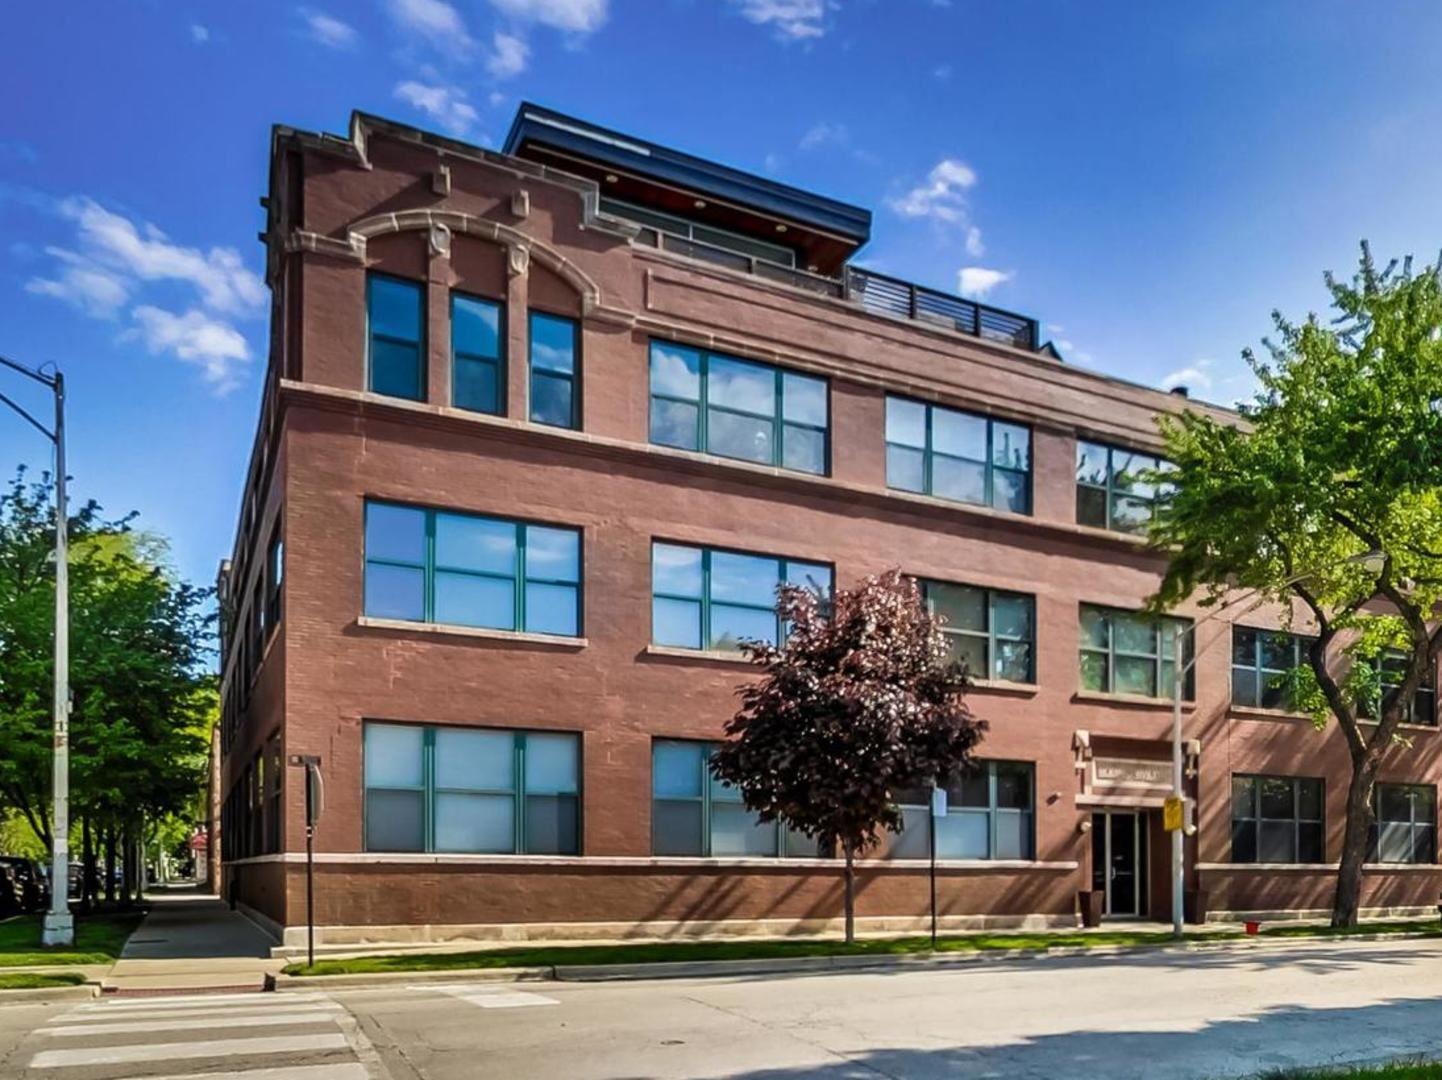 2250 W Ohio Street #102, Chicago, IL 60612 - #: 10727503